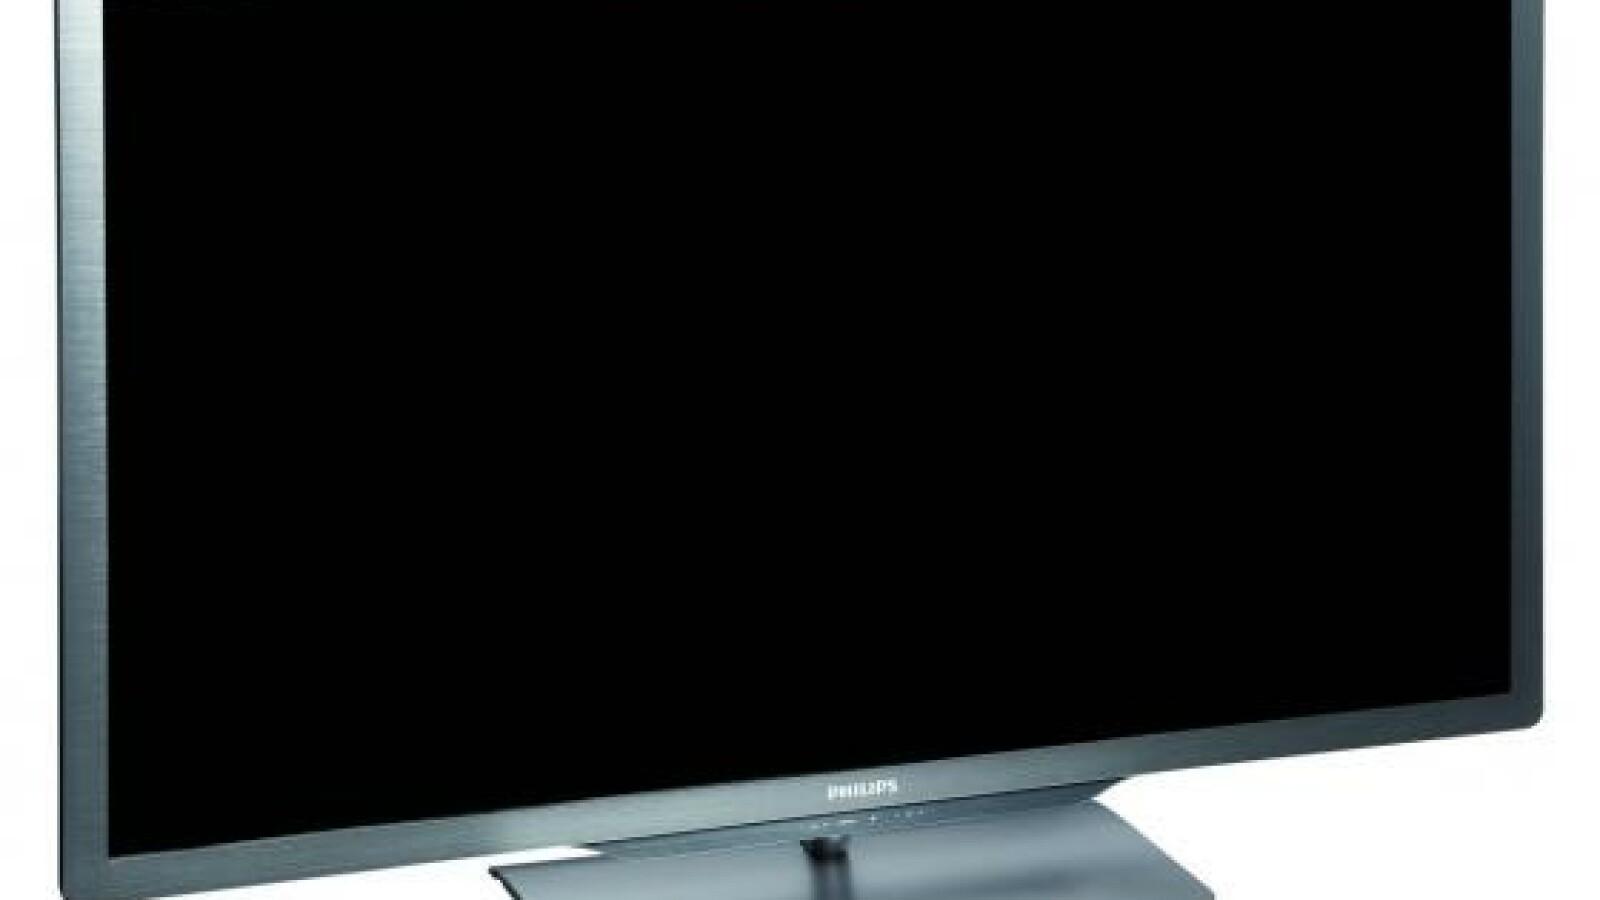 philips 47 pfl 7606 lcd tv mit passiver polfilter 3d. Black Bedroom Furniture Sets. Home Design Ideas